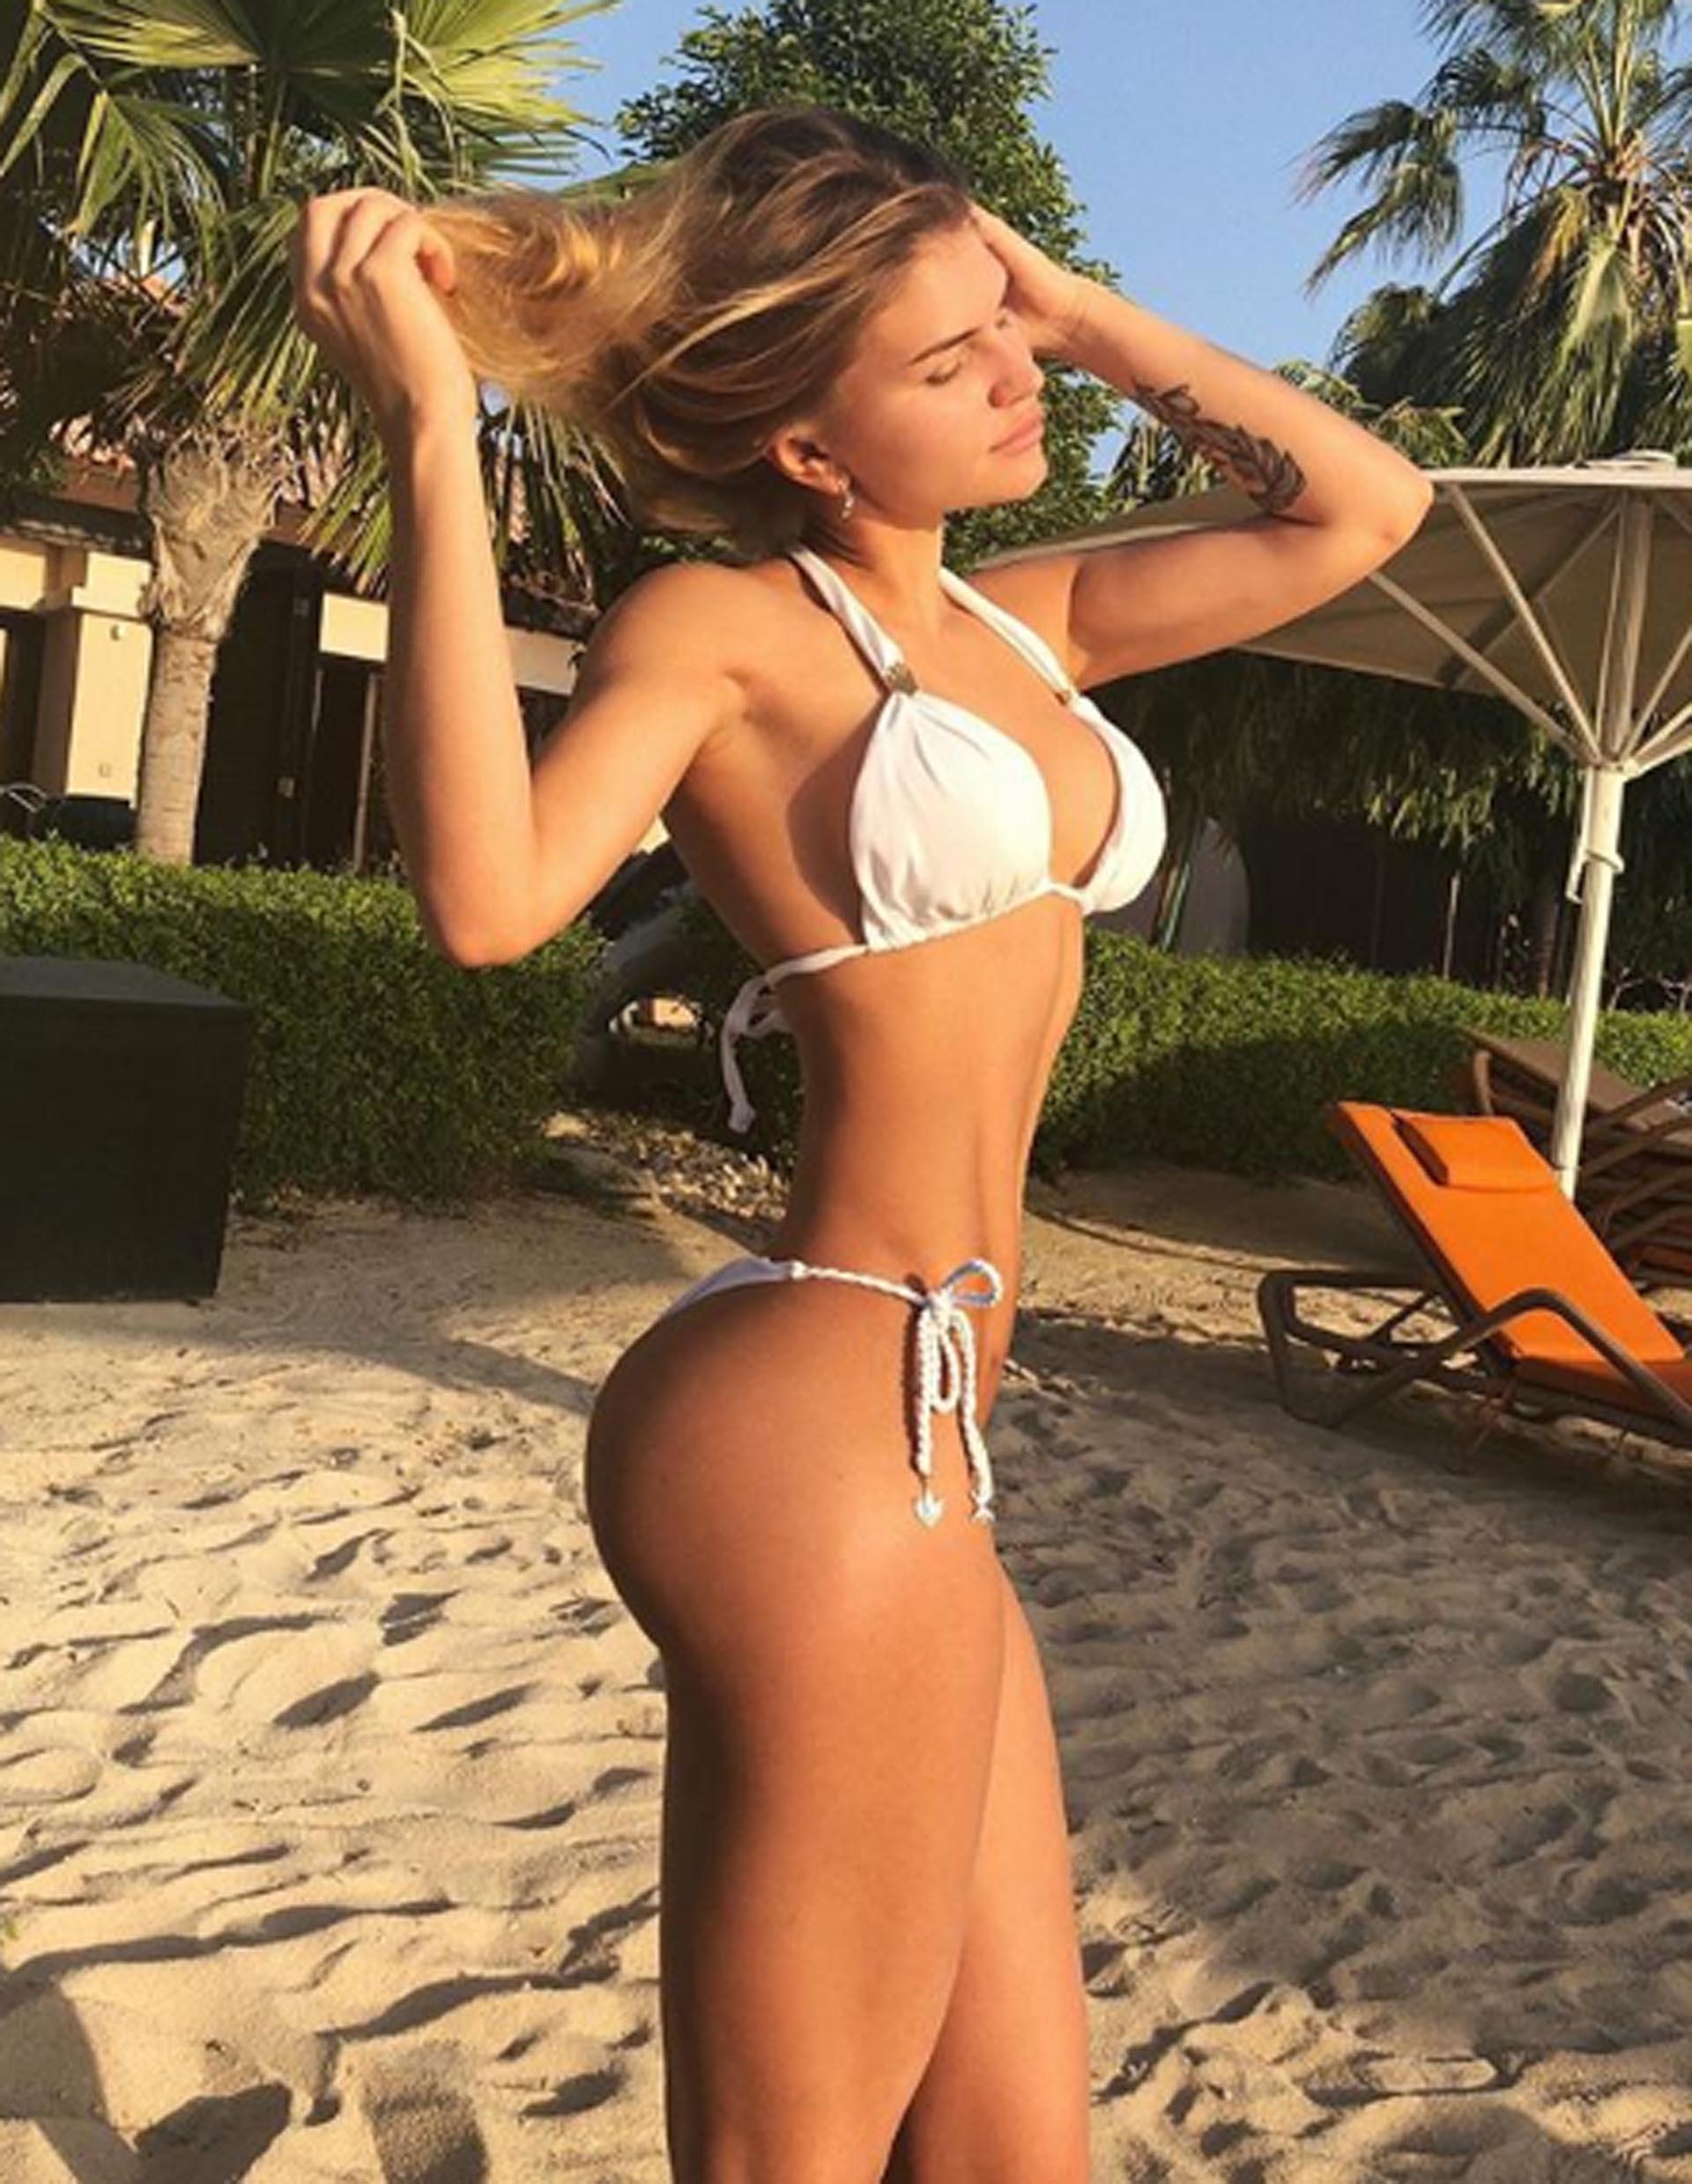 Anastasiia Mironova